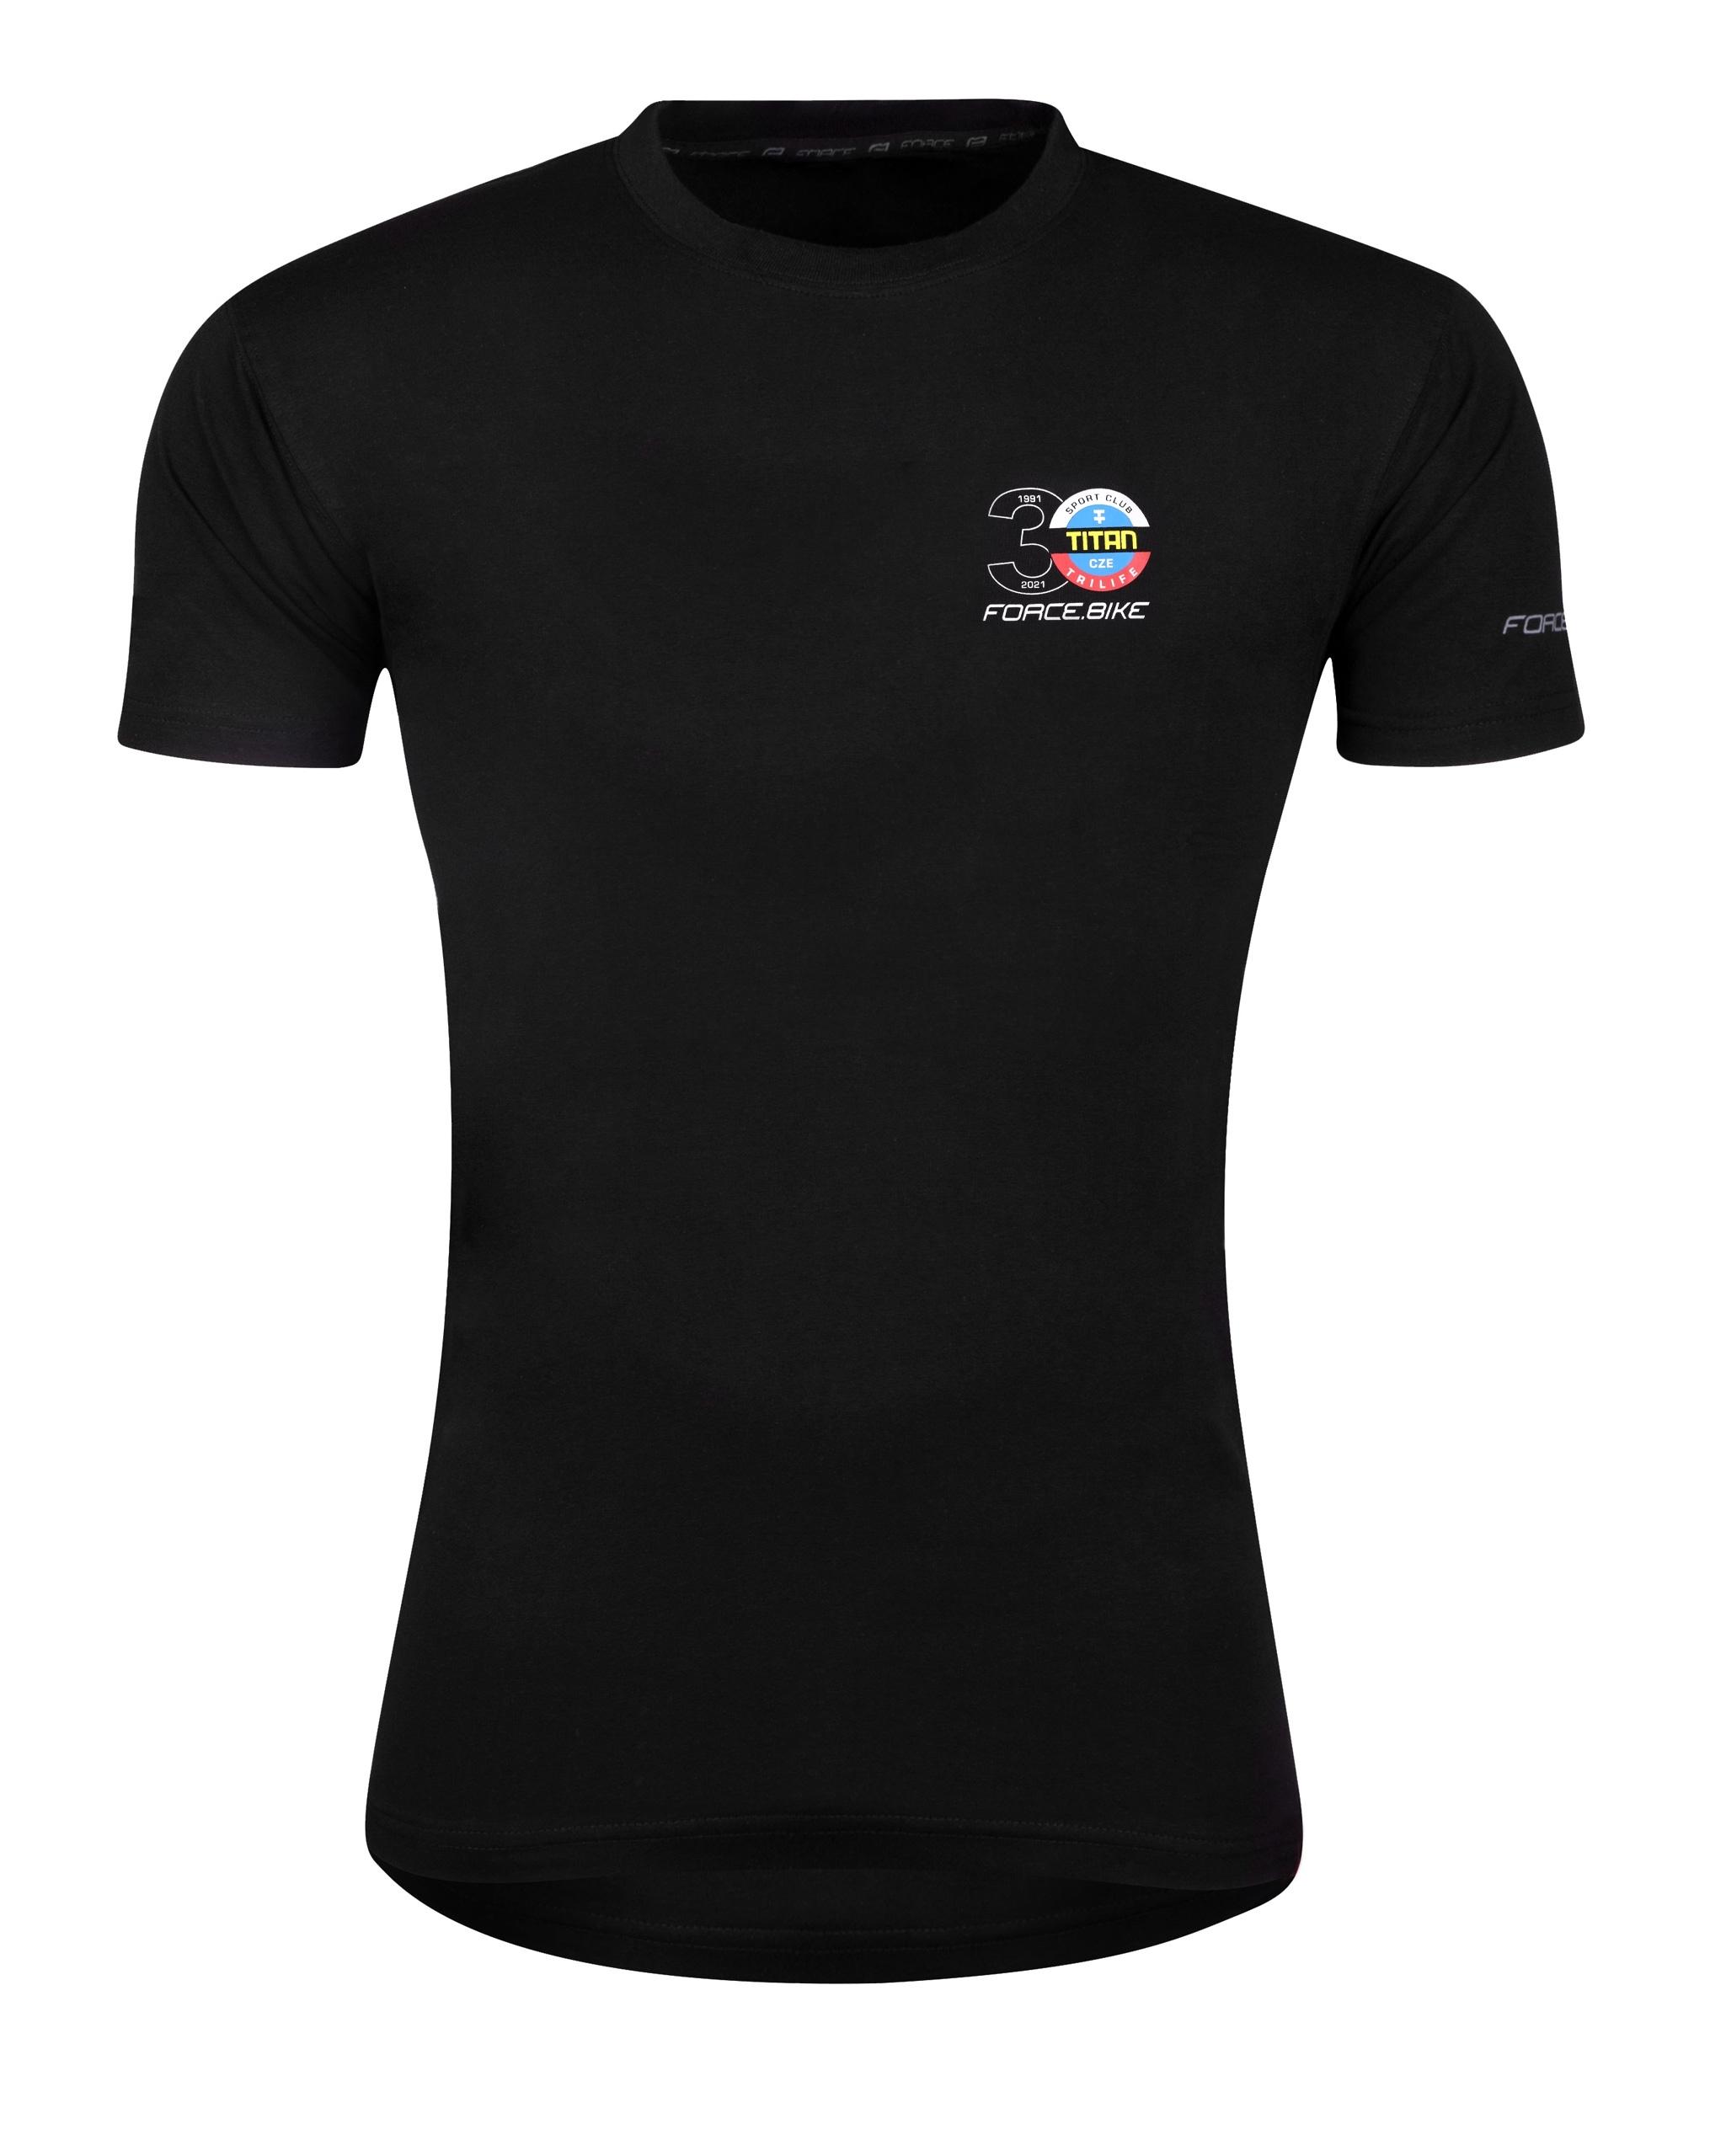 triko FORCE TITAN TRILIFE krátký rukáv, černé XL